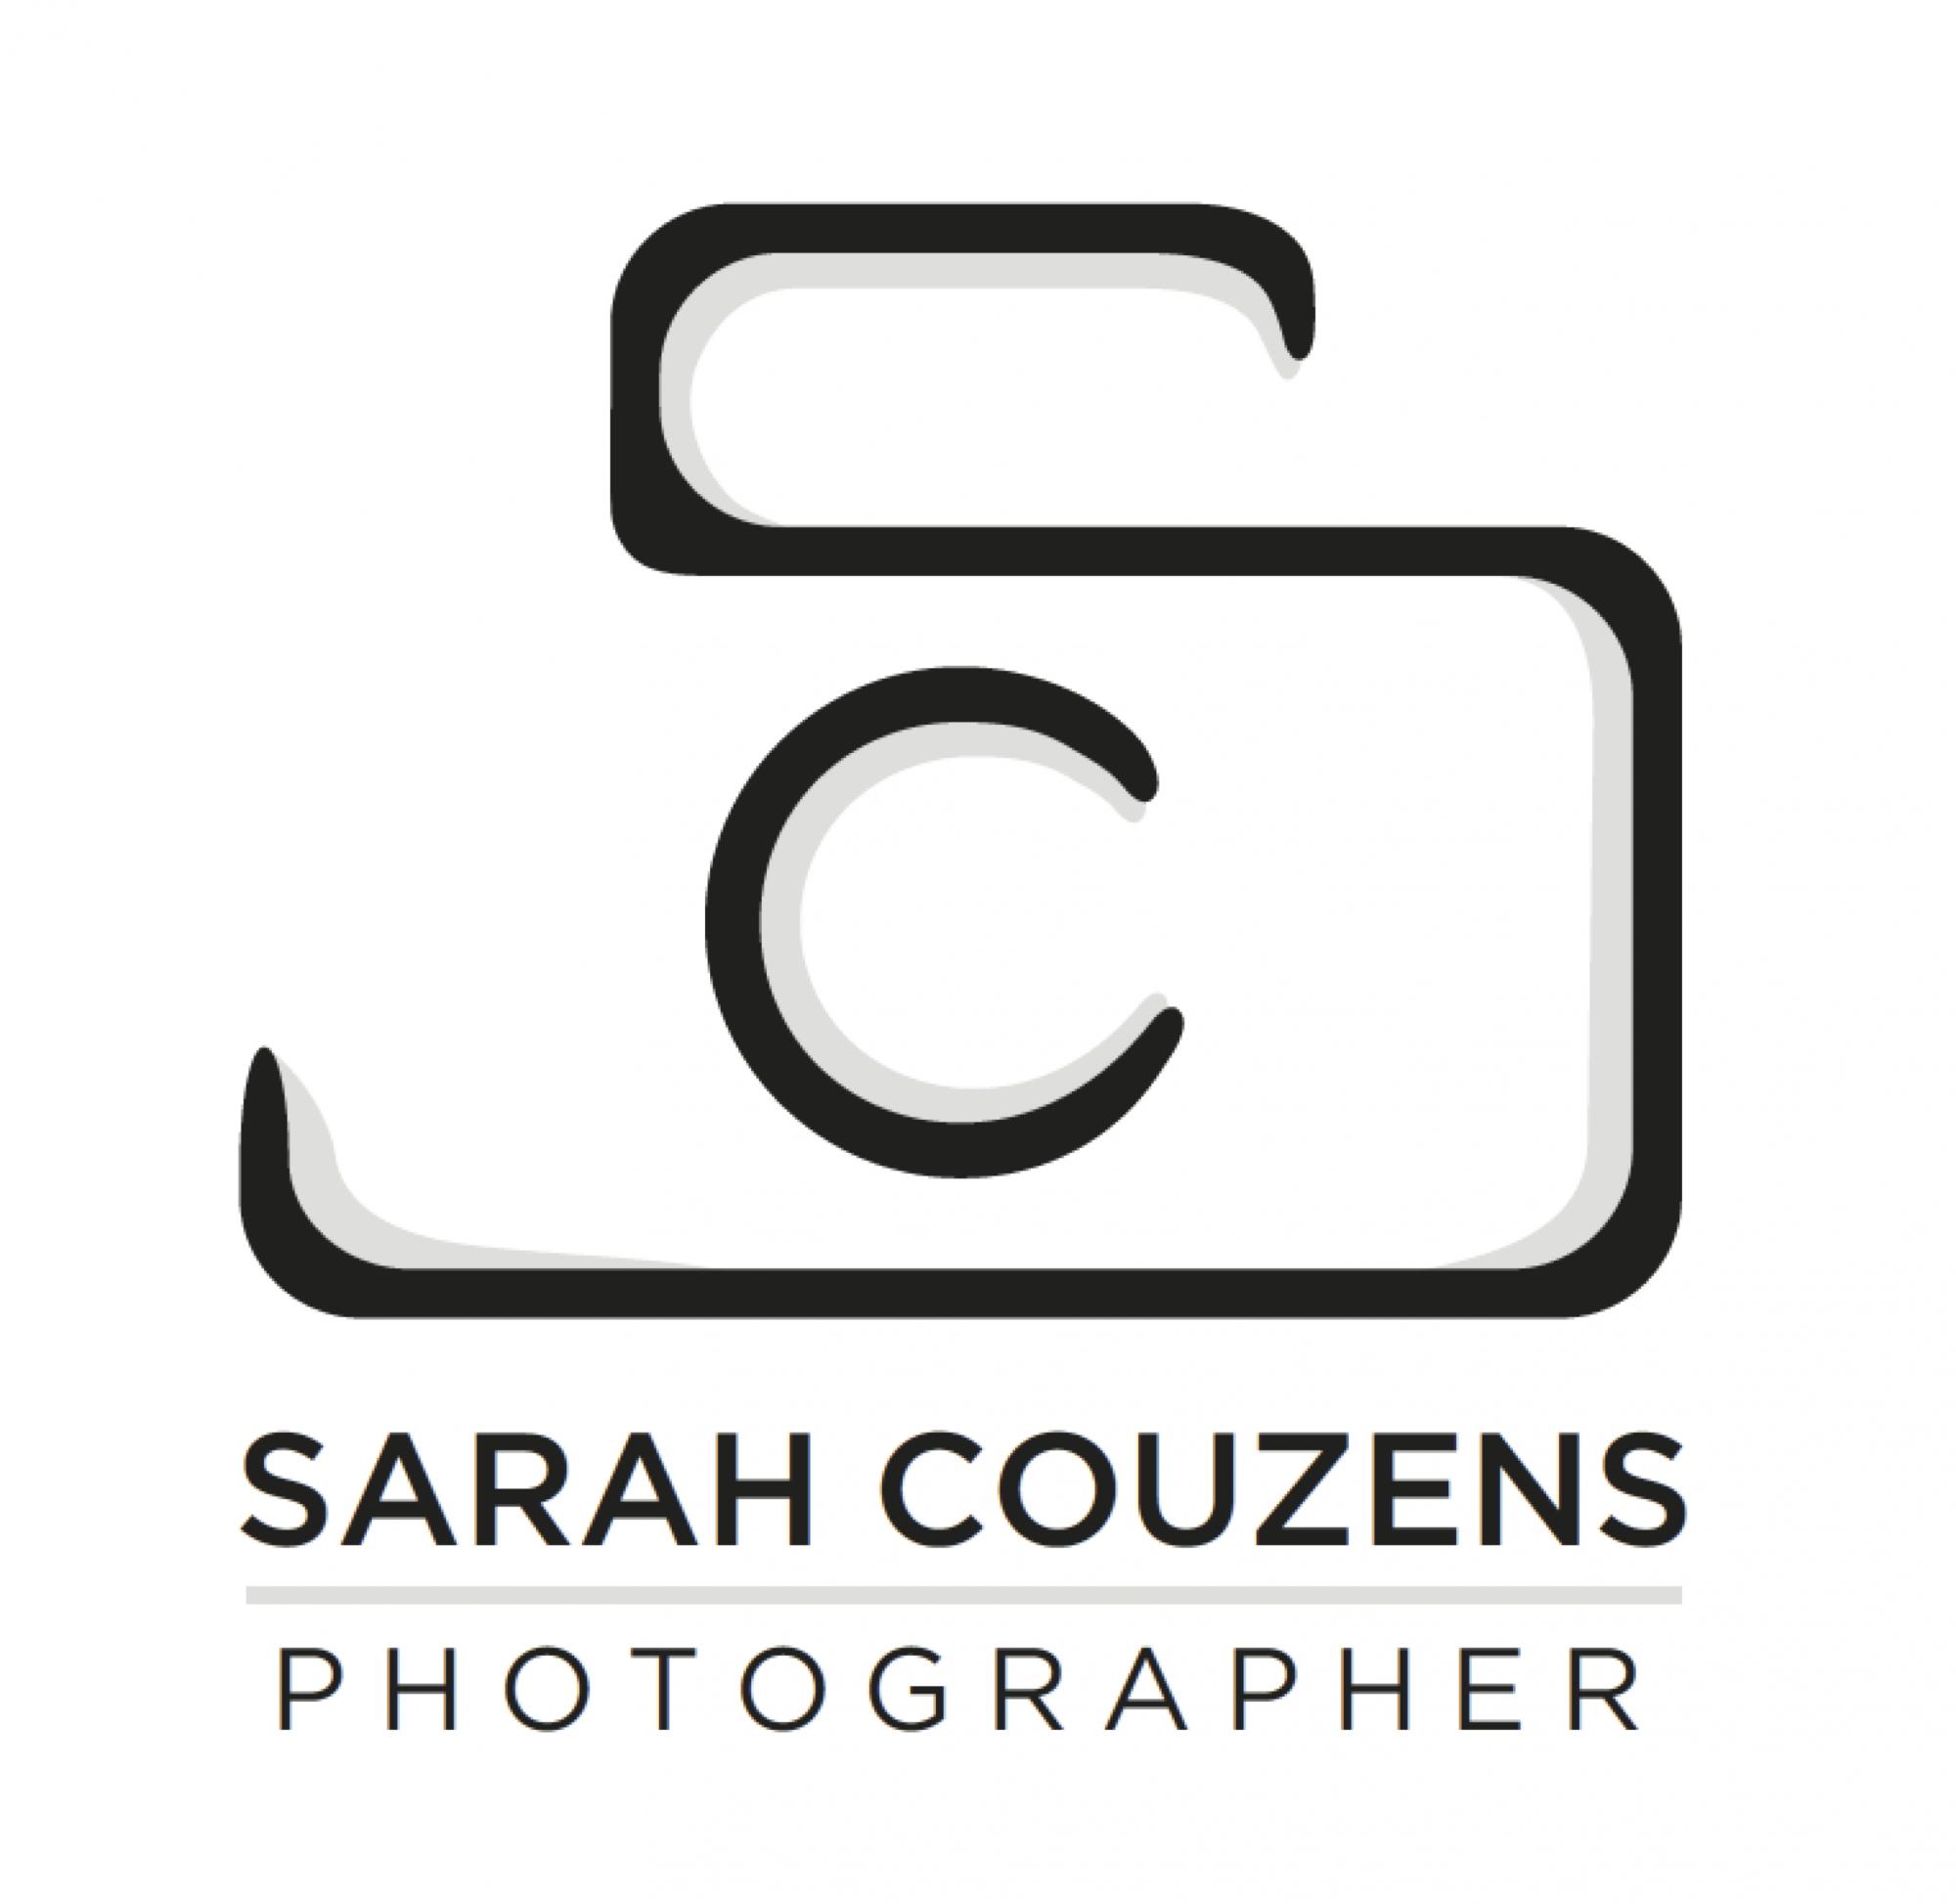 17 Camera Logo Vector Png Images - Camera Logo Clip Art, Camera Aperture Logo and Camera Logos ...